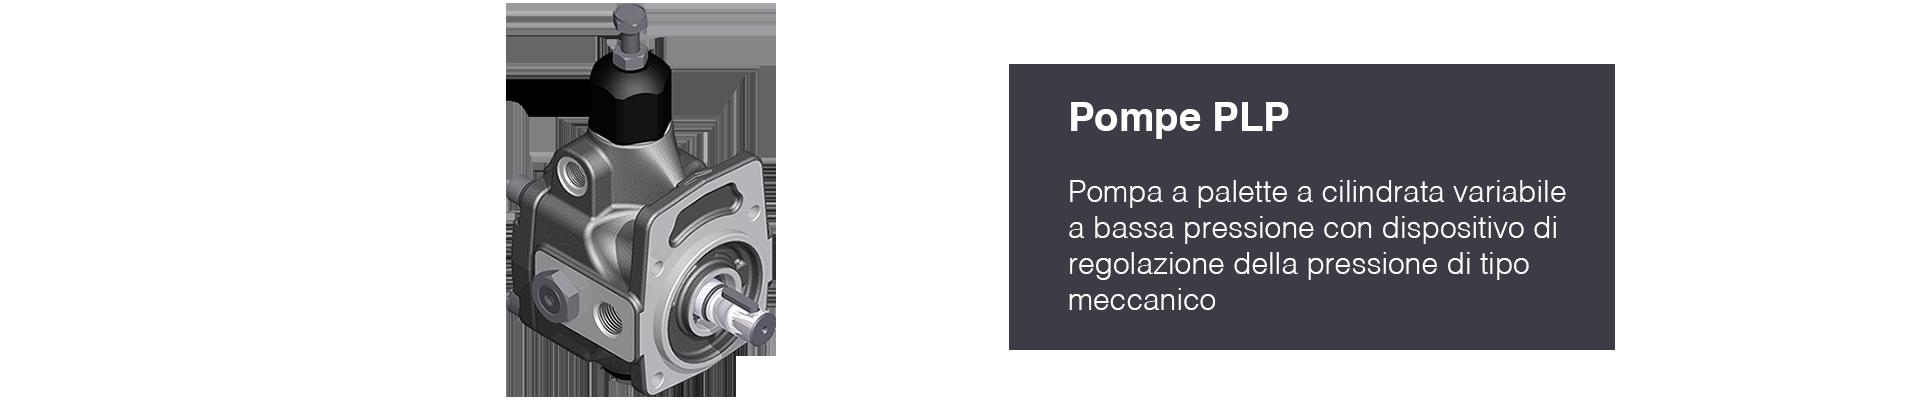 pompe_plp_top